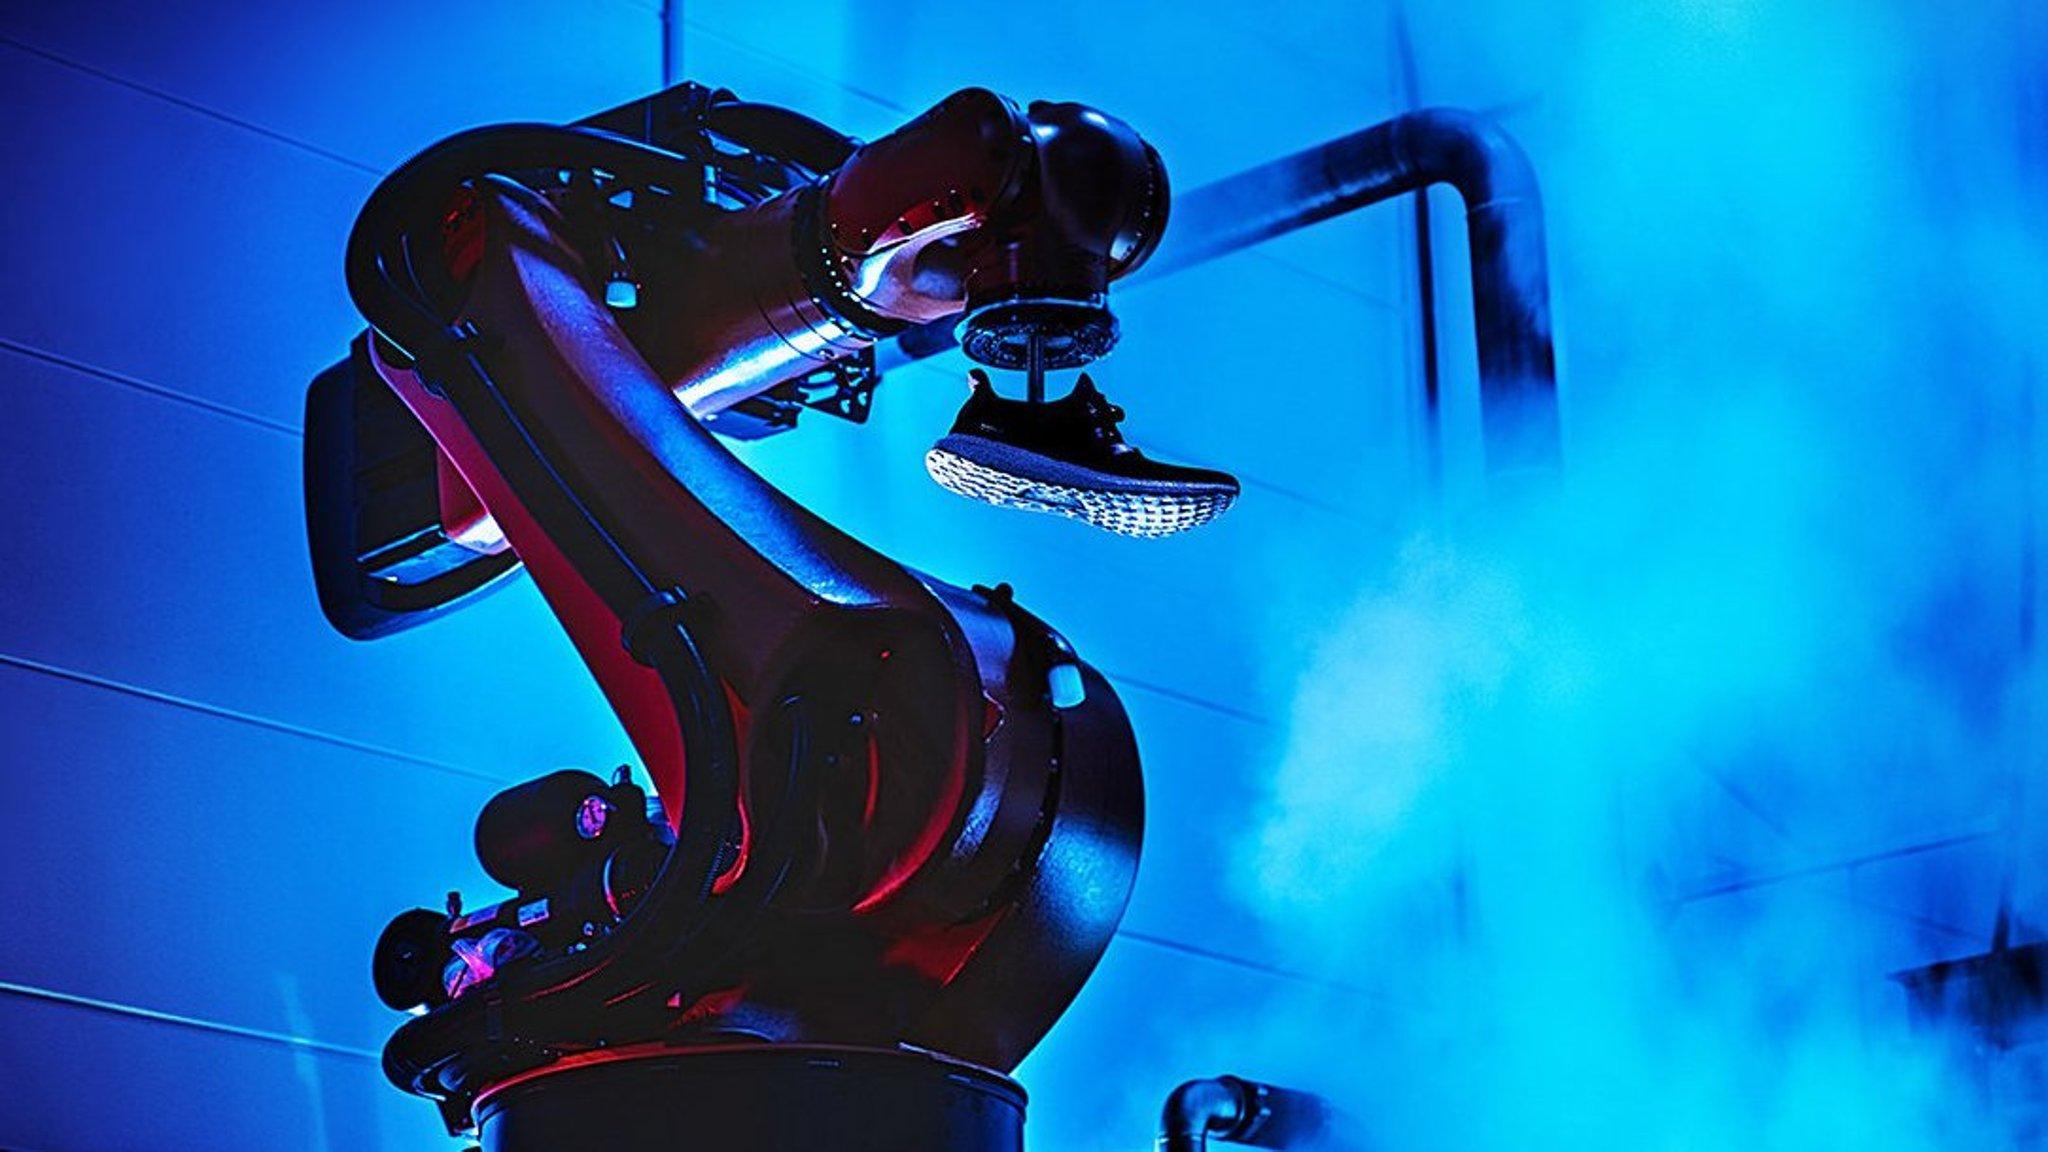 Interrupción neumático Inducir  Robot revolution helps Adidas bring shoemaking back to Germany | Financial  Times